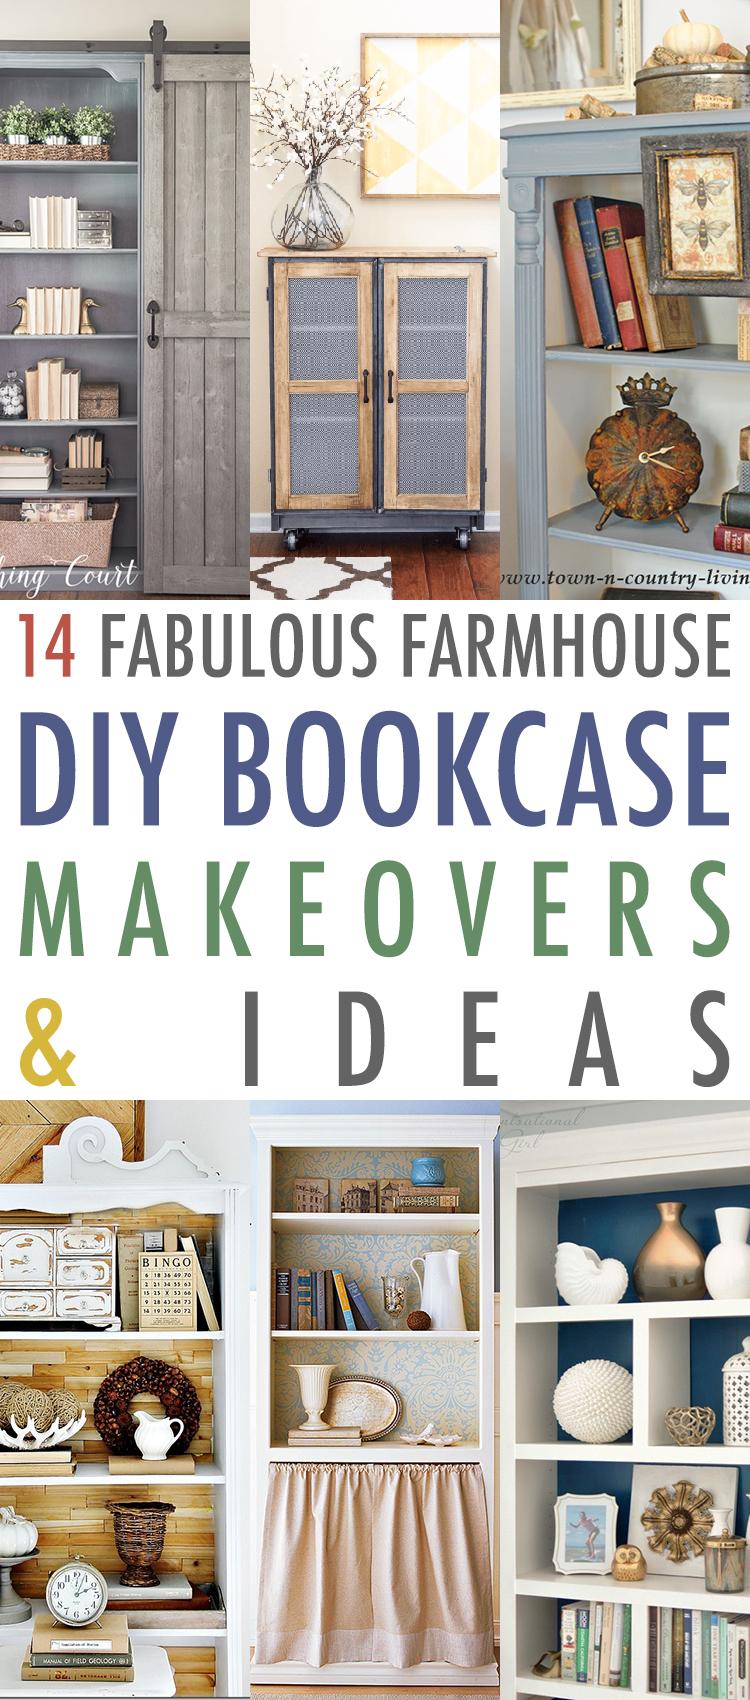 14 Fabulous Farmhouse Diy Bookcase Ideas Makeovers The